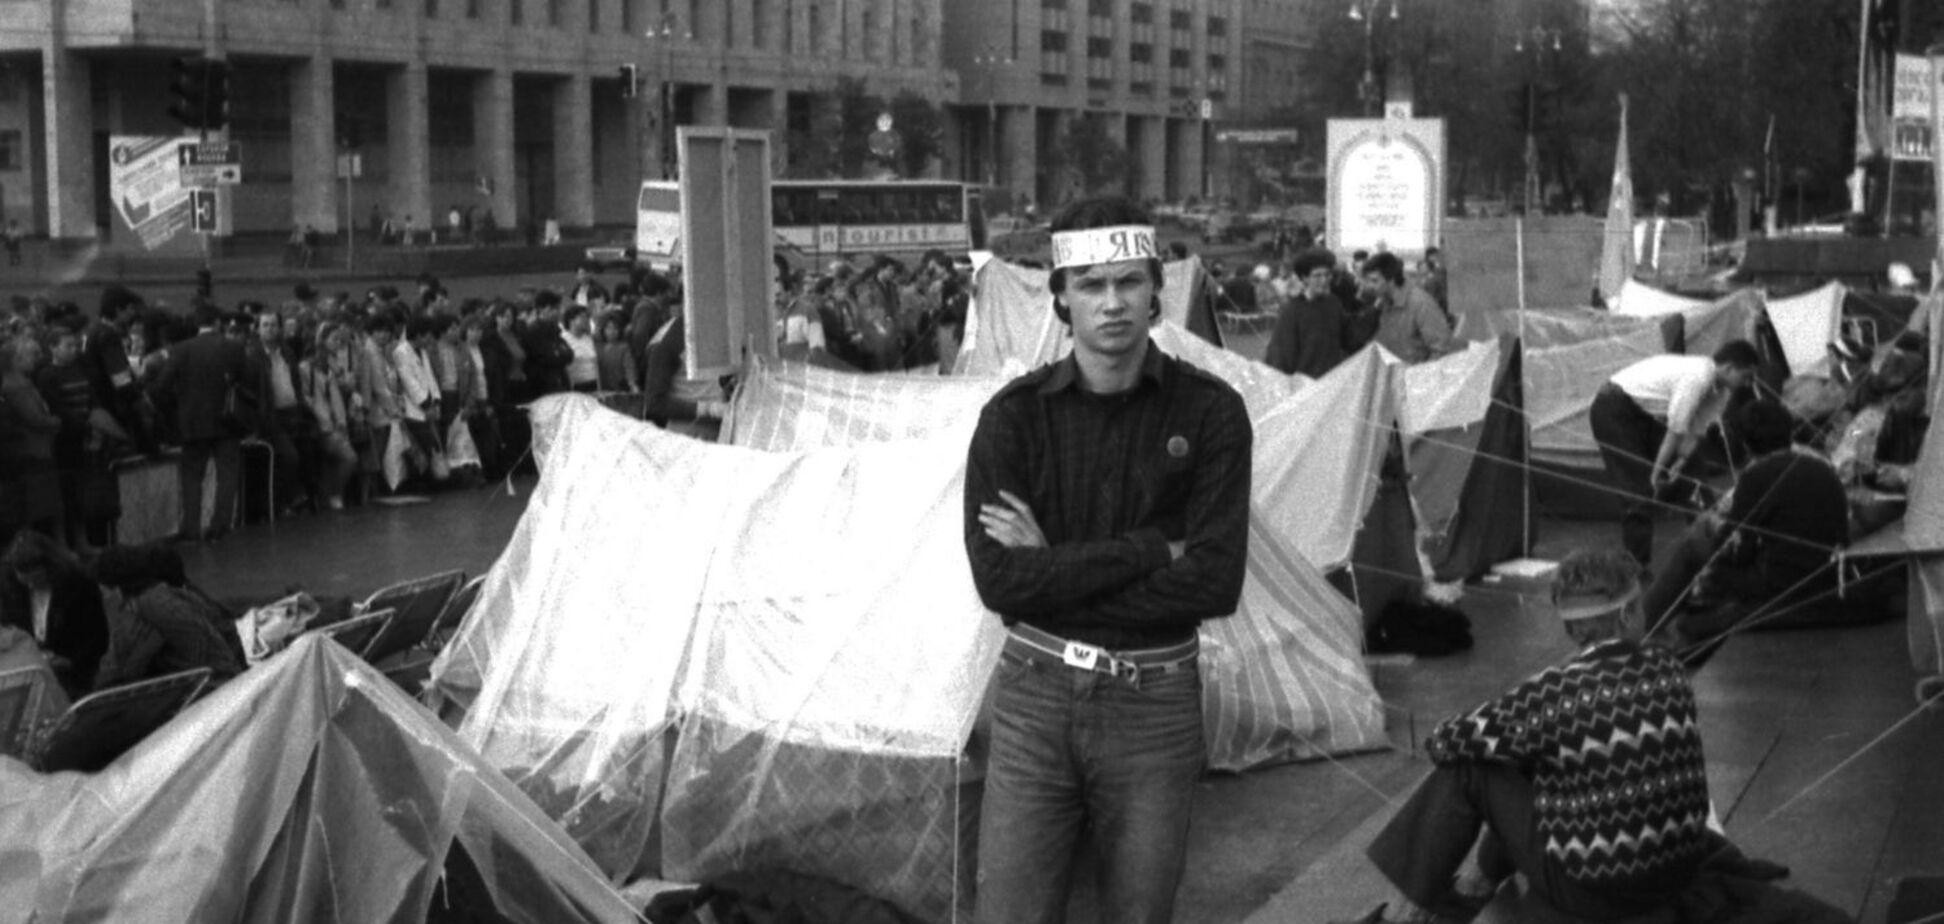 Революция на граните началась 30 лет назад